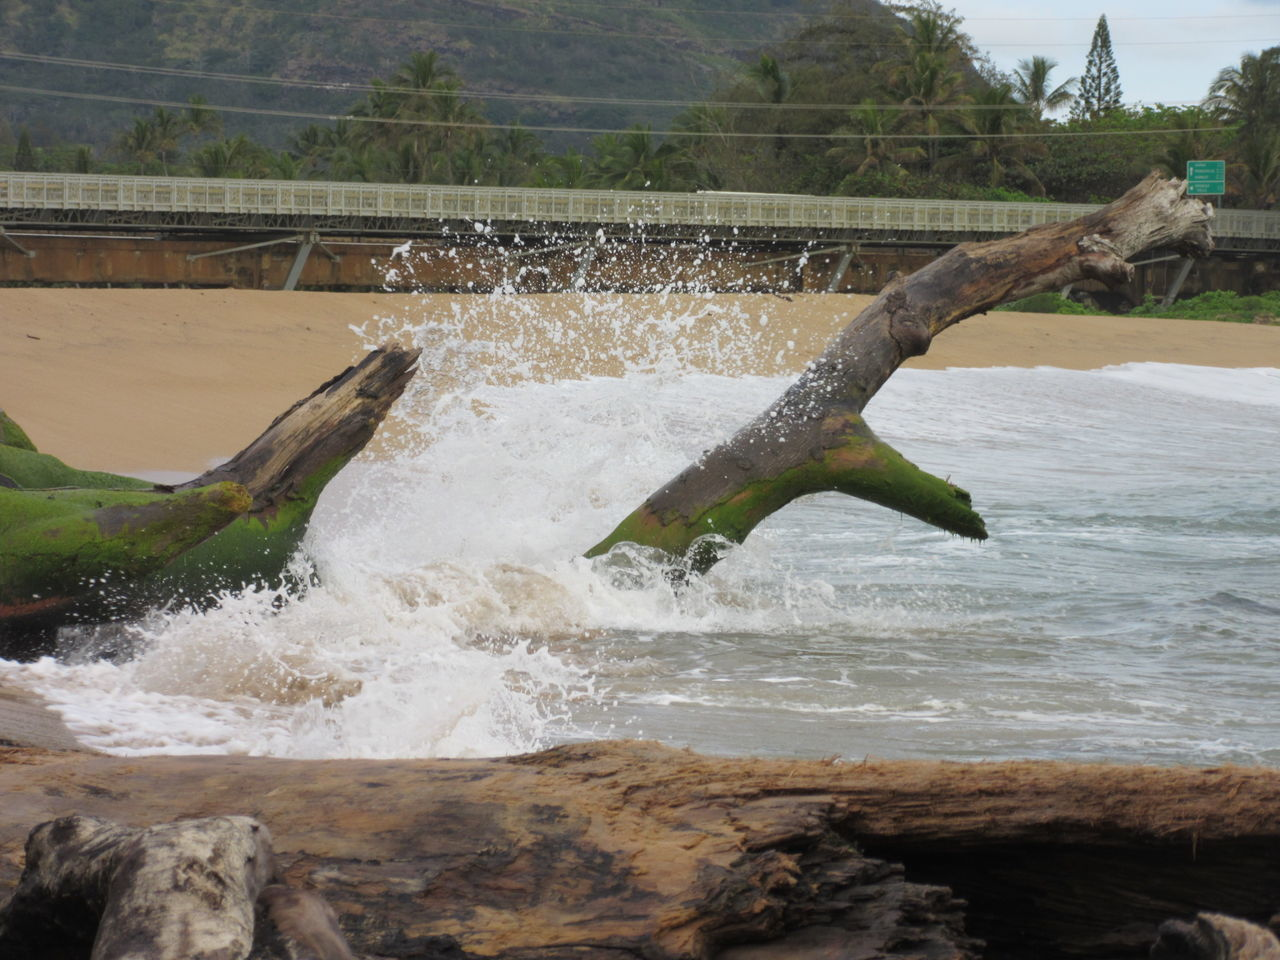 Splashing Water Motion Spraying Outdoors Tree Beauty In Nature Power In Nature Kauai, Hawaii Driftwood